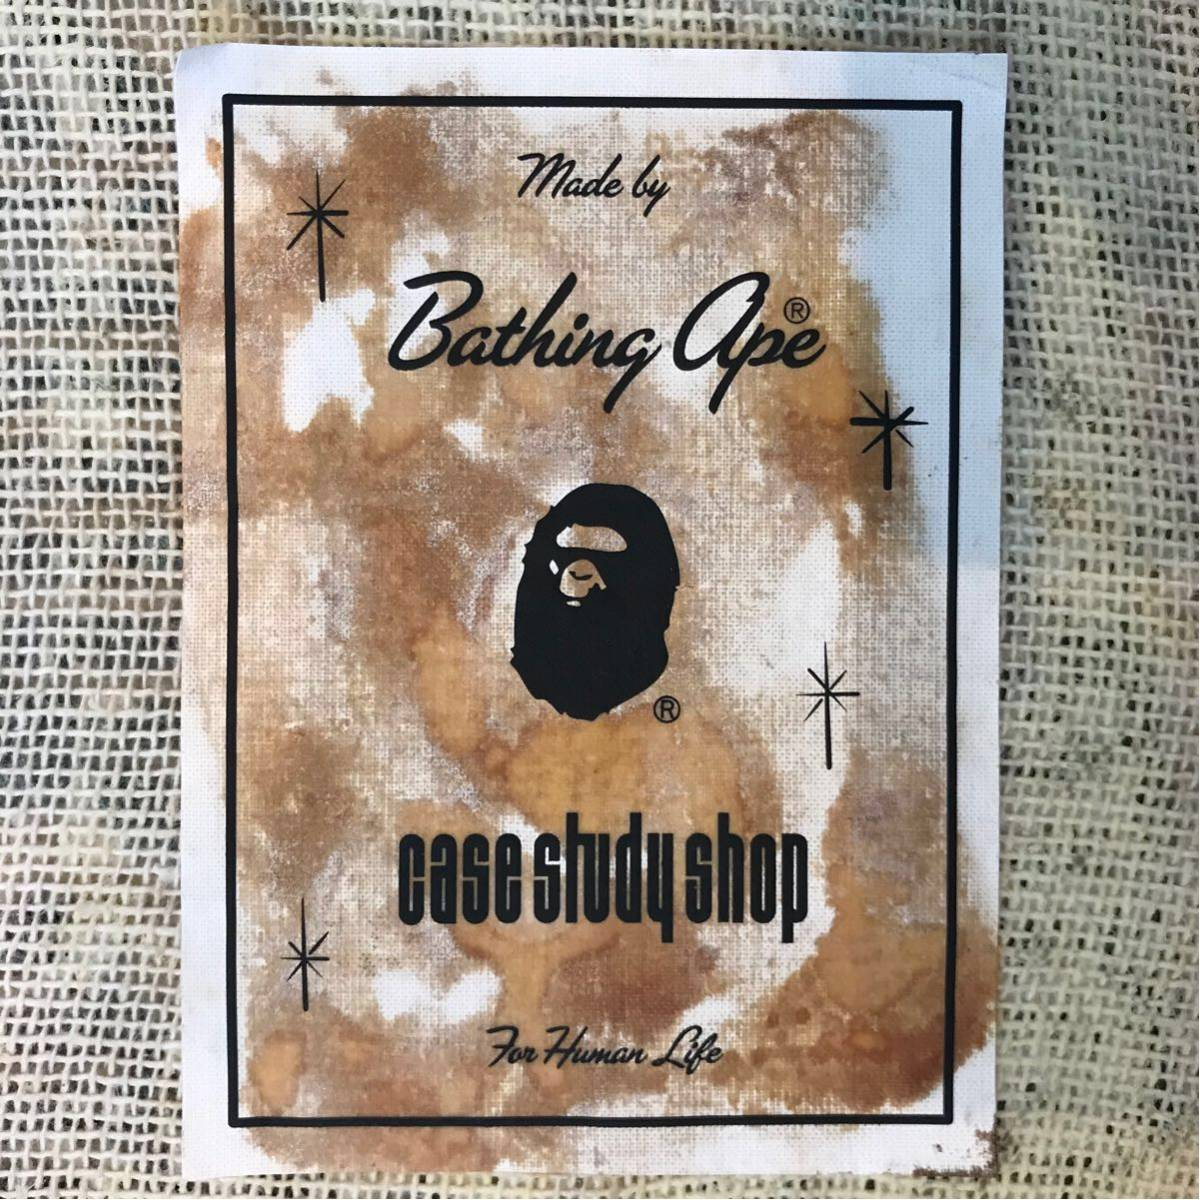 MODERNICA × BAPE CAMO 特大 ラグ マット a bathing ape モダニカ エイプ ベイプ CASE STUDY SHOP 絨毯 アベイシングエイプ NIGO 迷彩